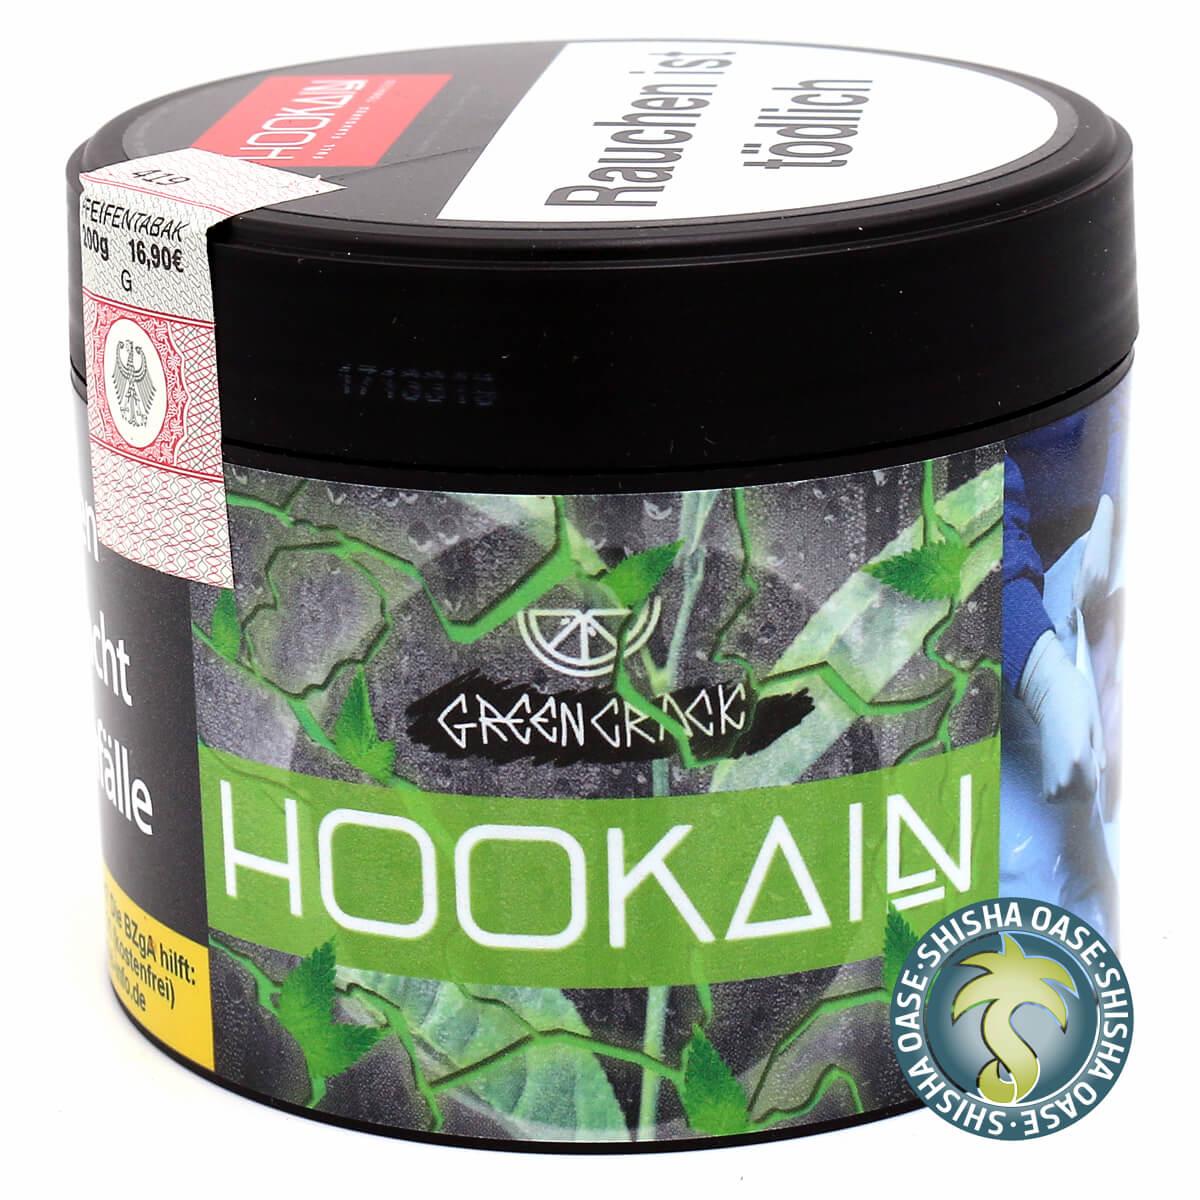 Hookain Tabak Green Crack 200g